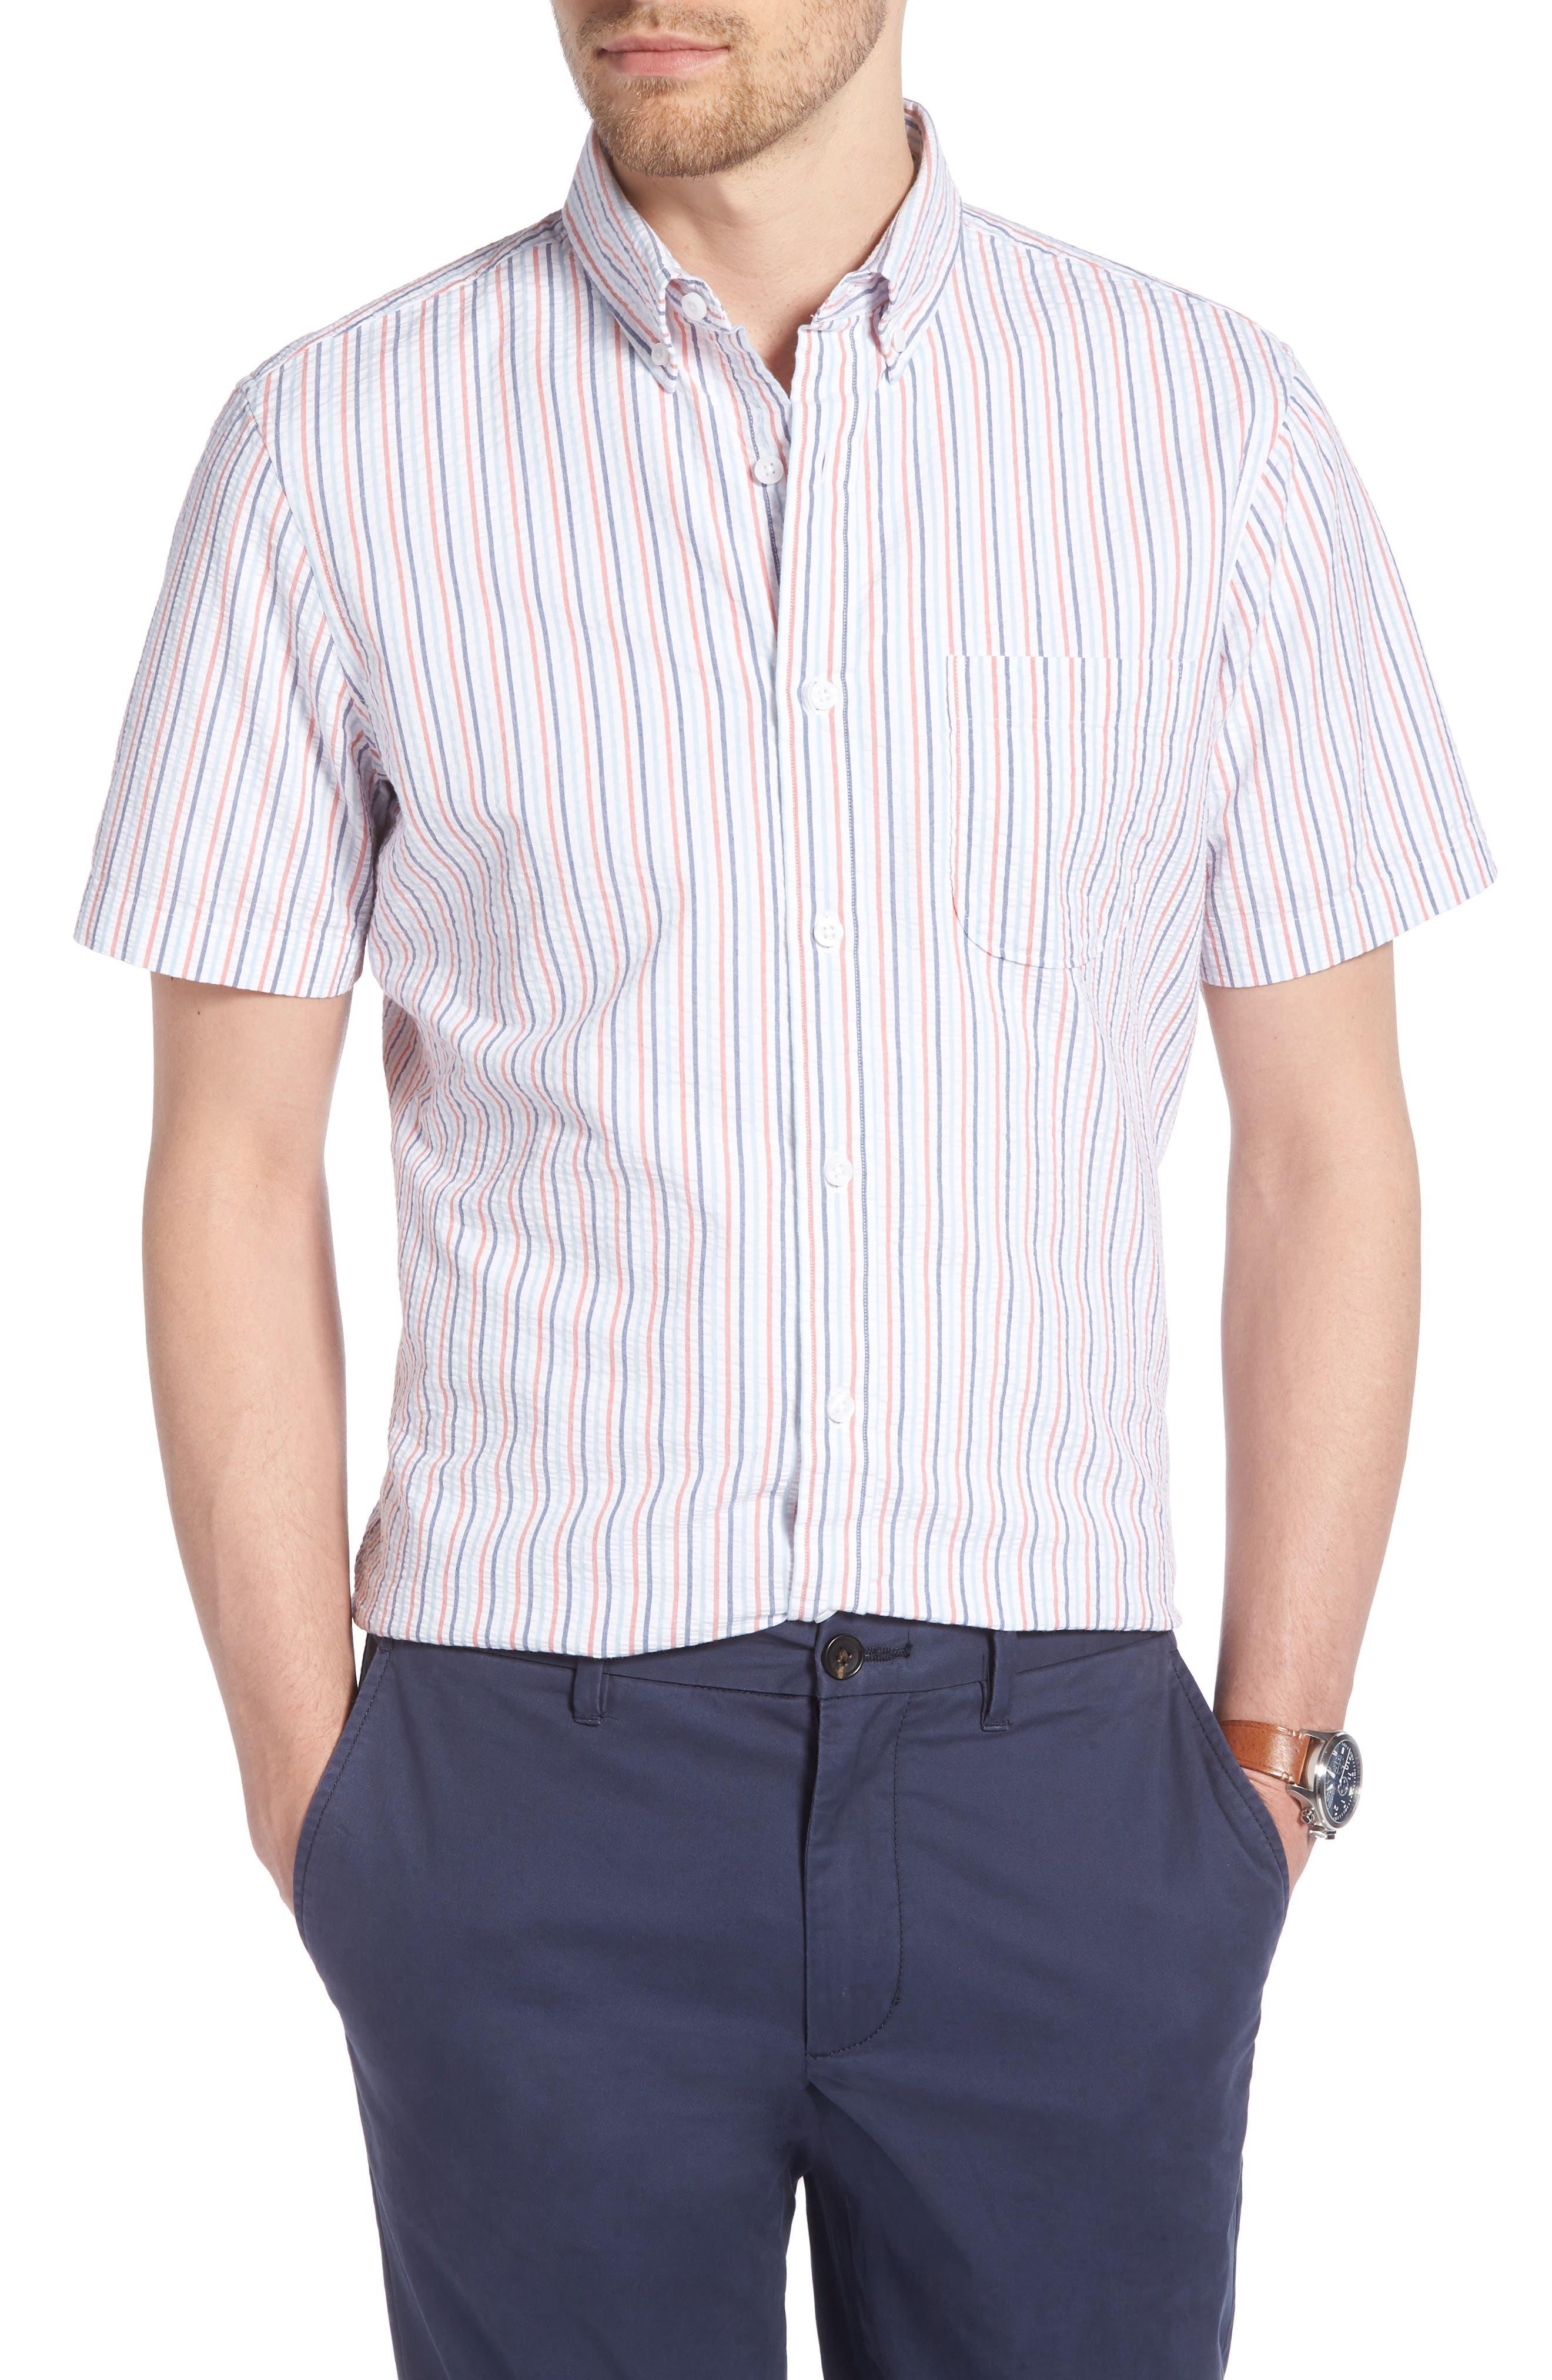 Trim Fit Seersucker Short Sleeve Sport Shirt,                         Main,                         color, White Multi Pencil Stripe